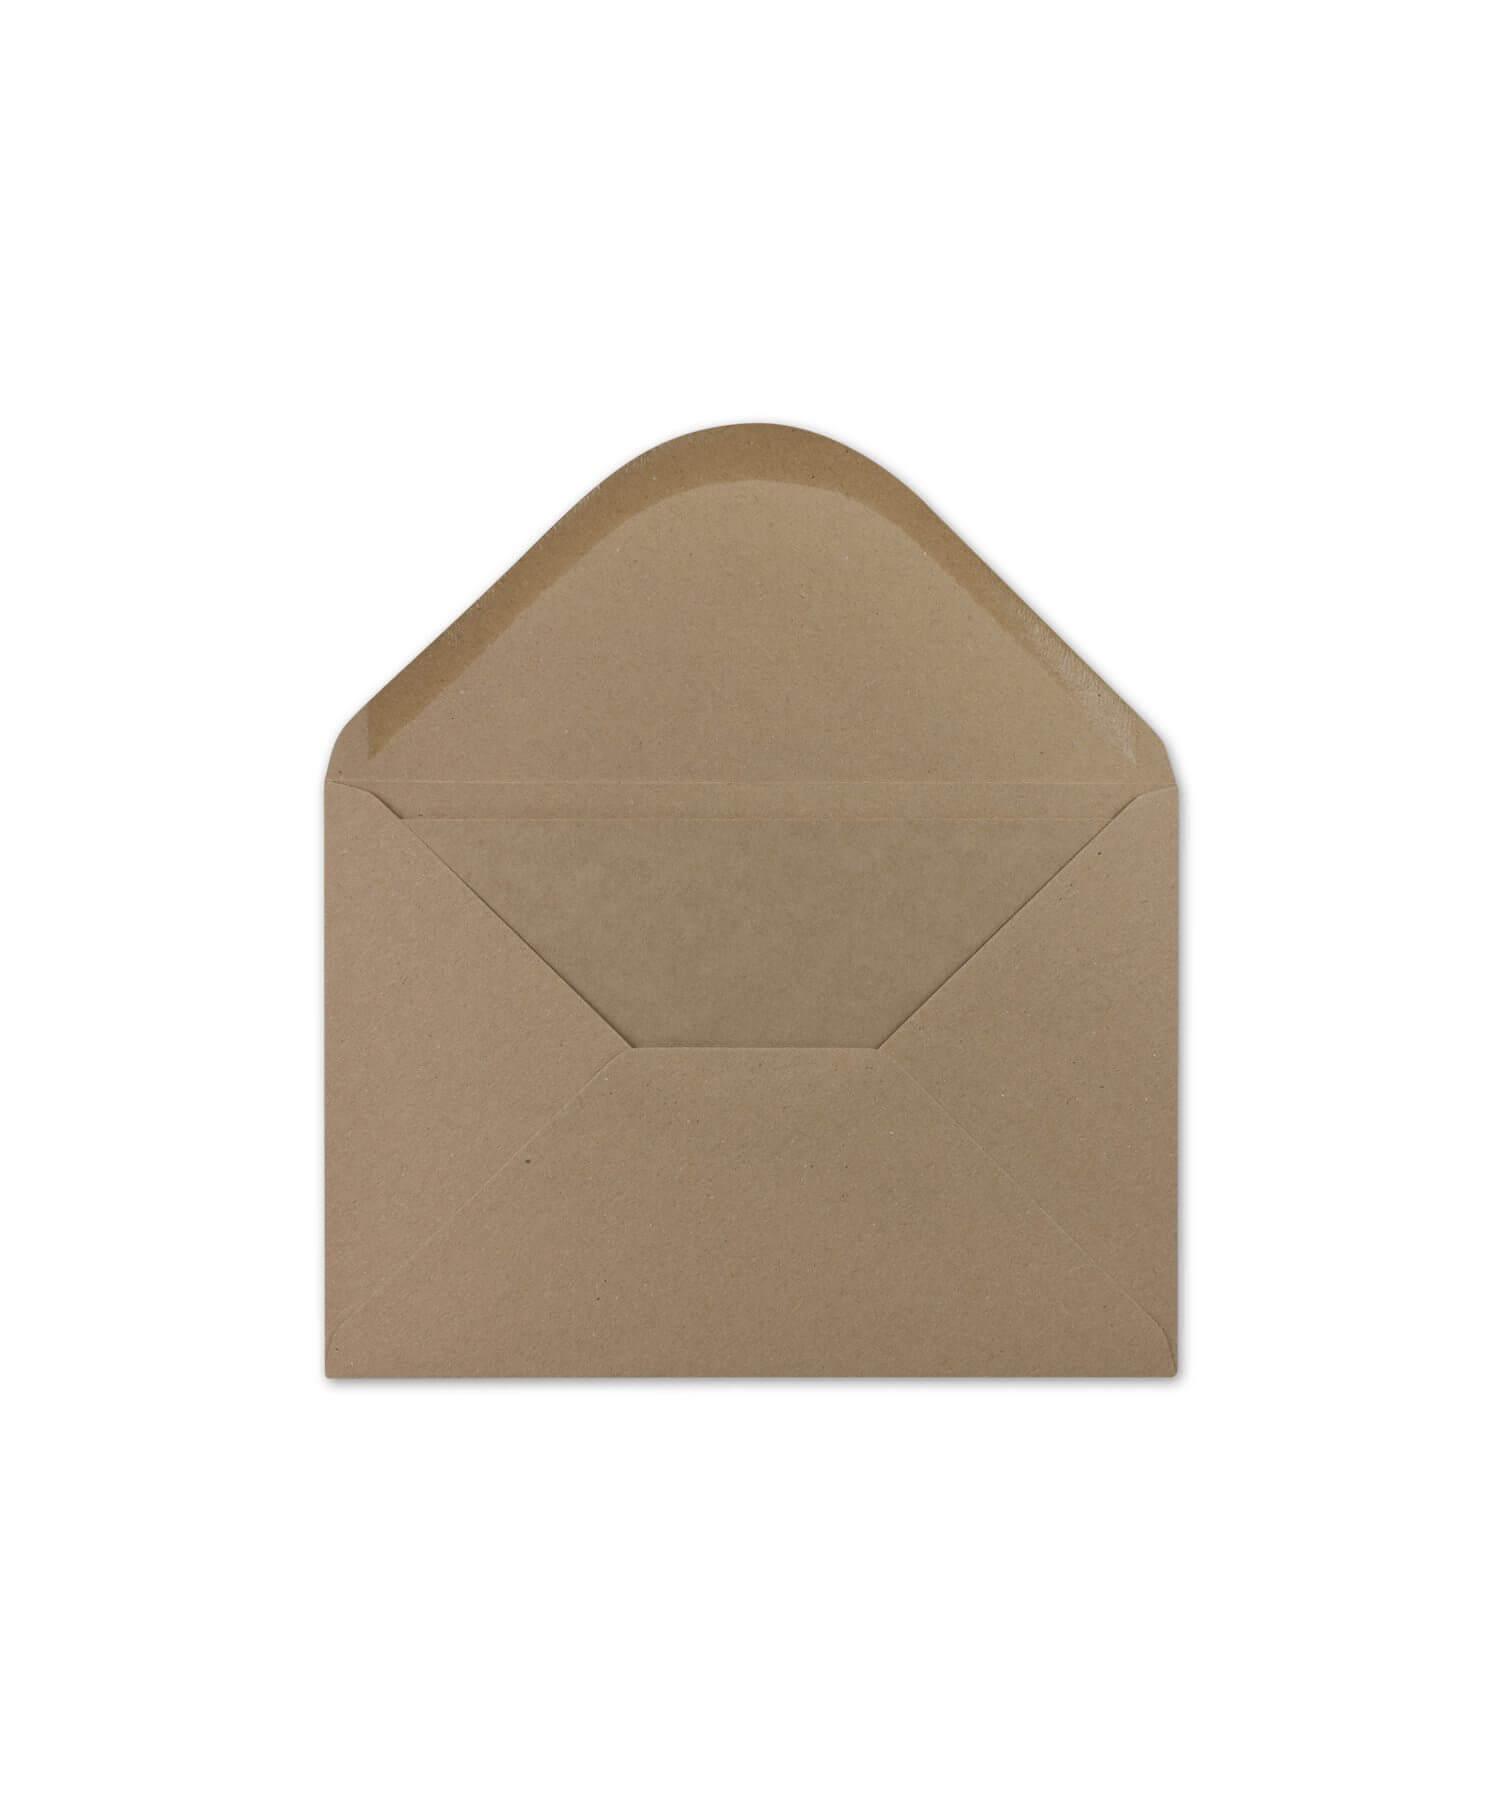 Matrosenhunde Weihnachtskarte Umschlag